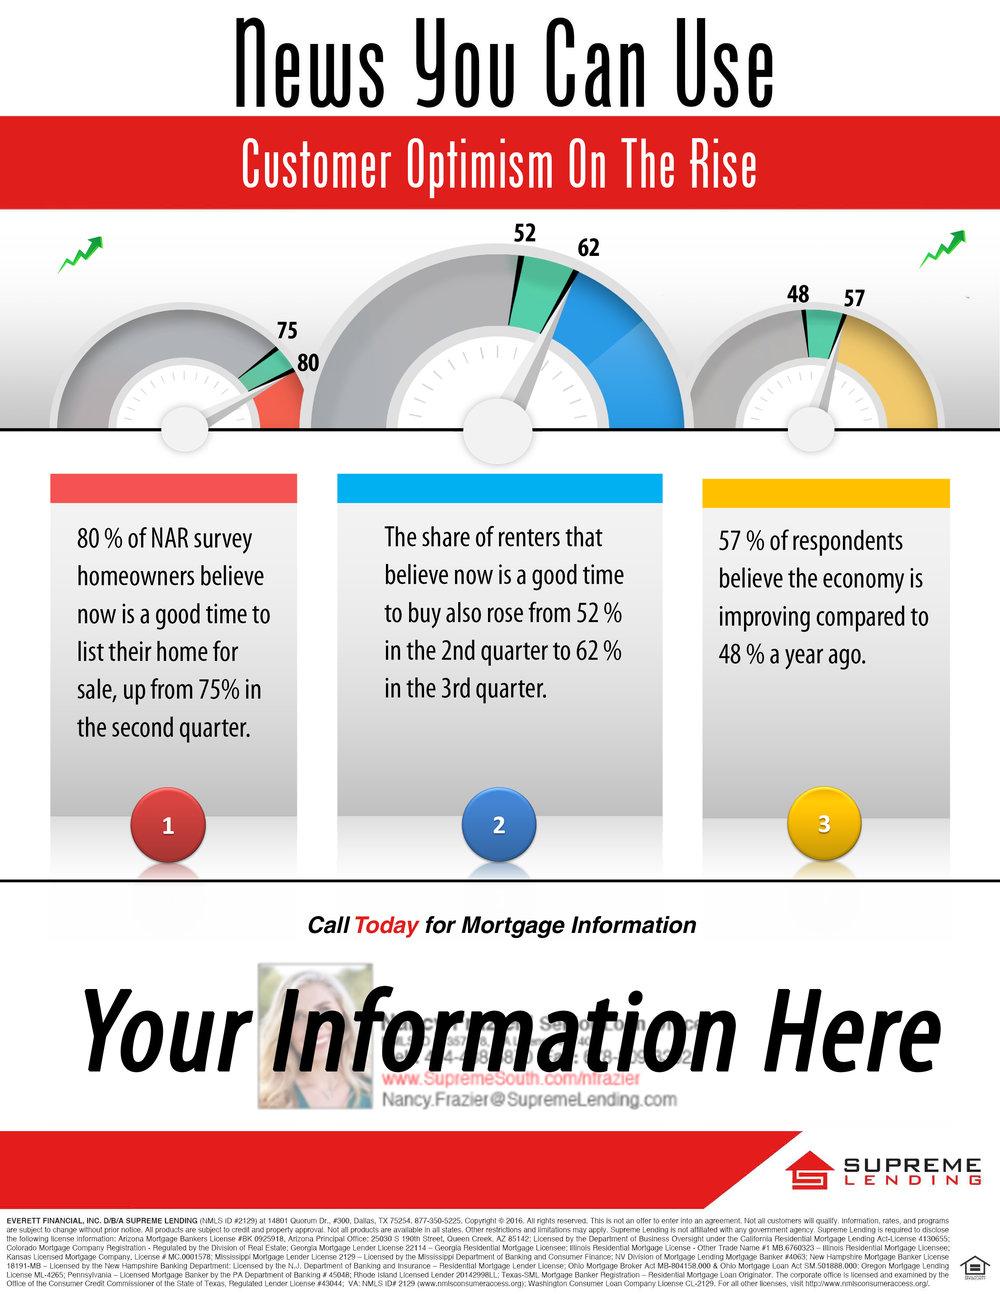 Customer Optimism On The Rise